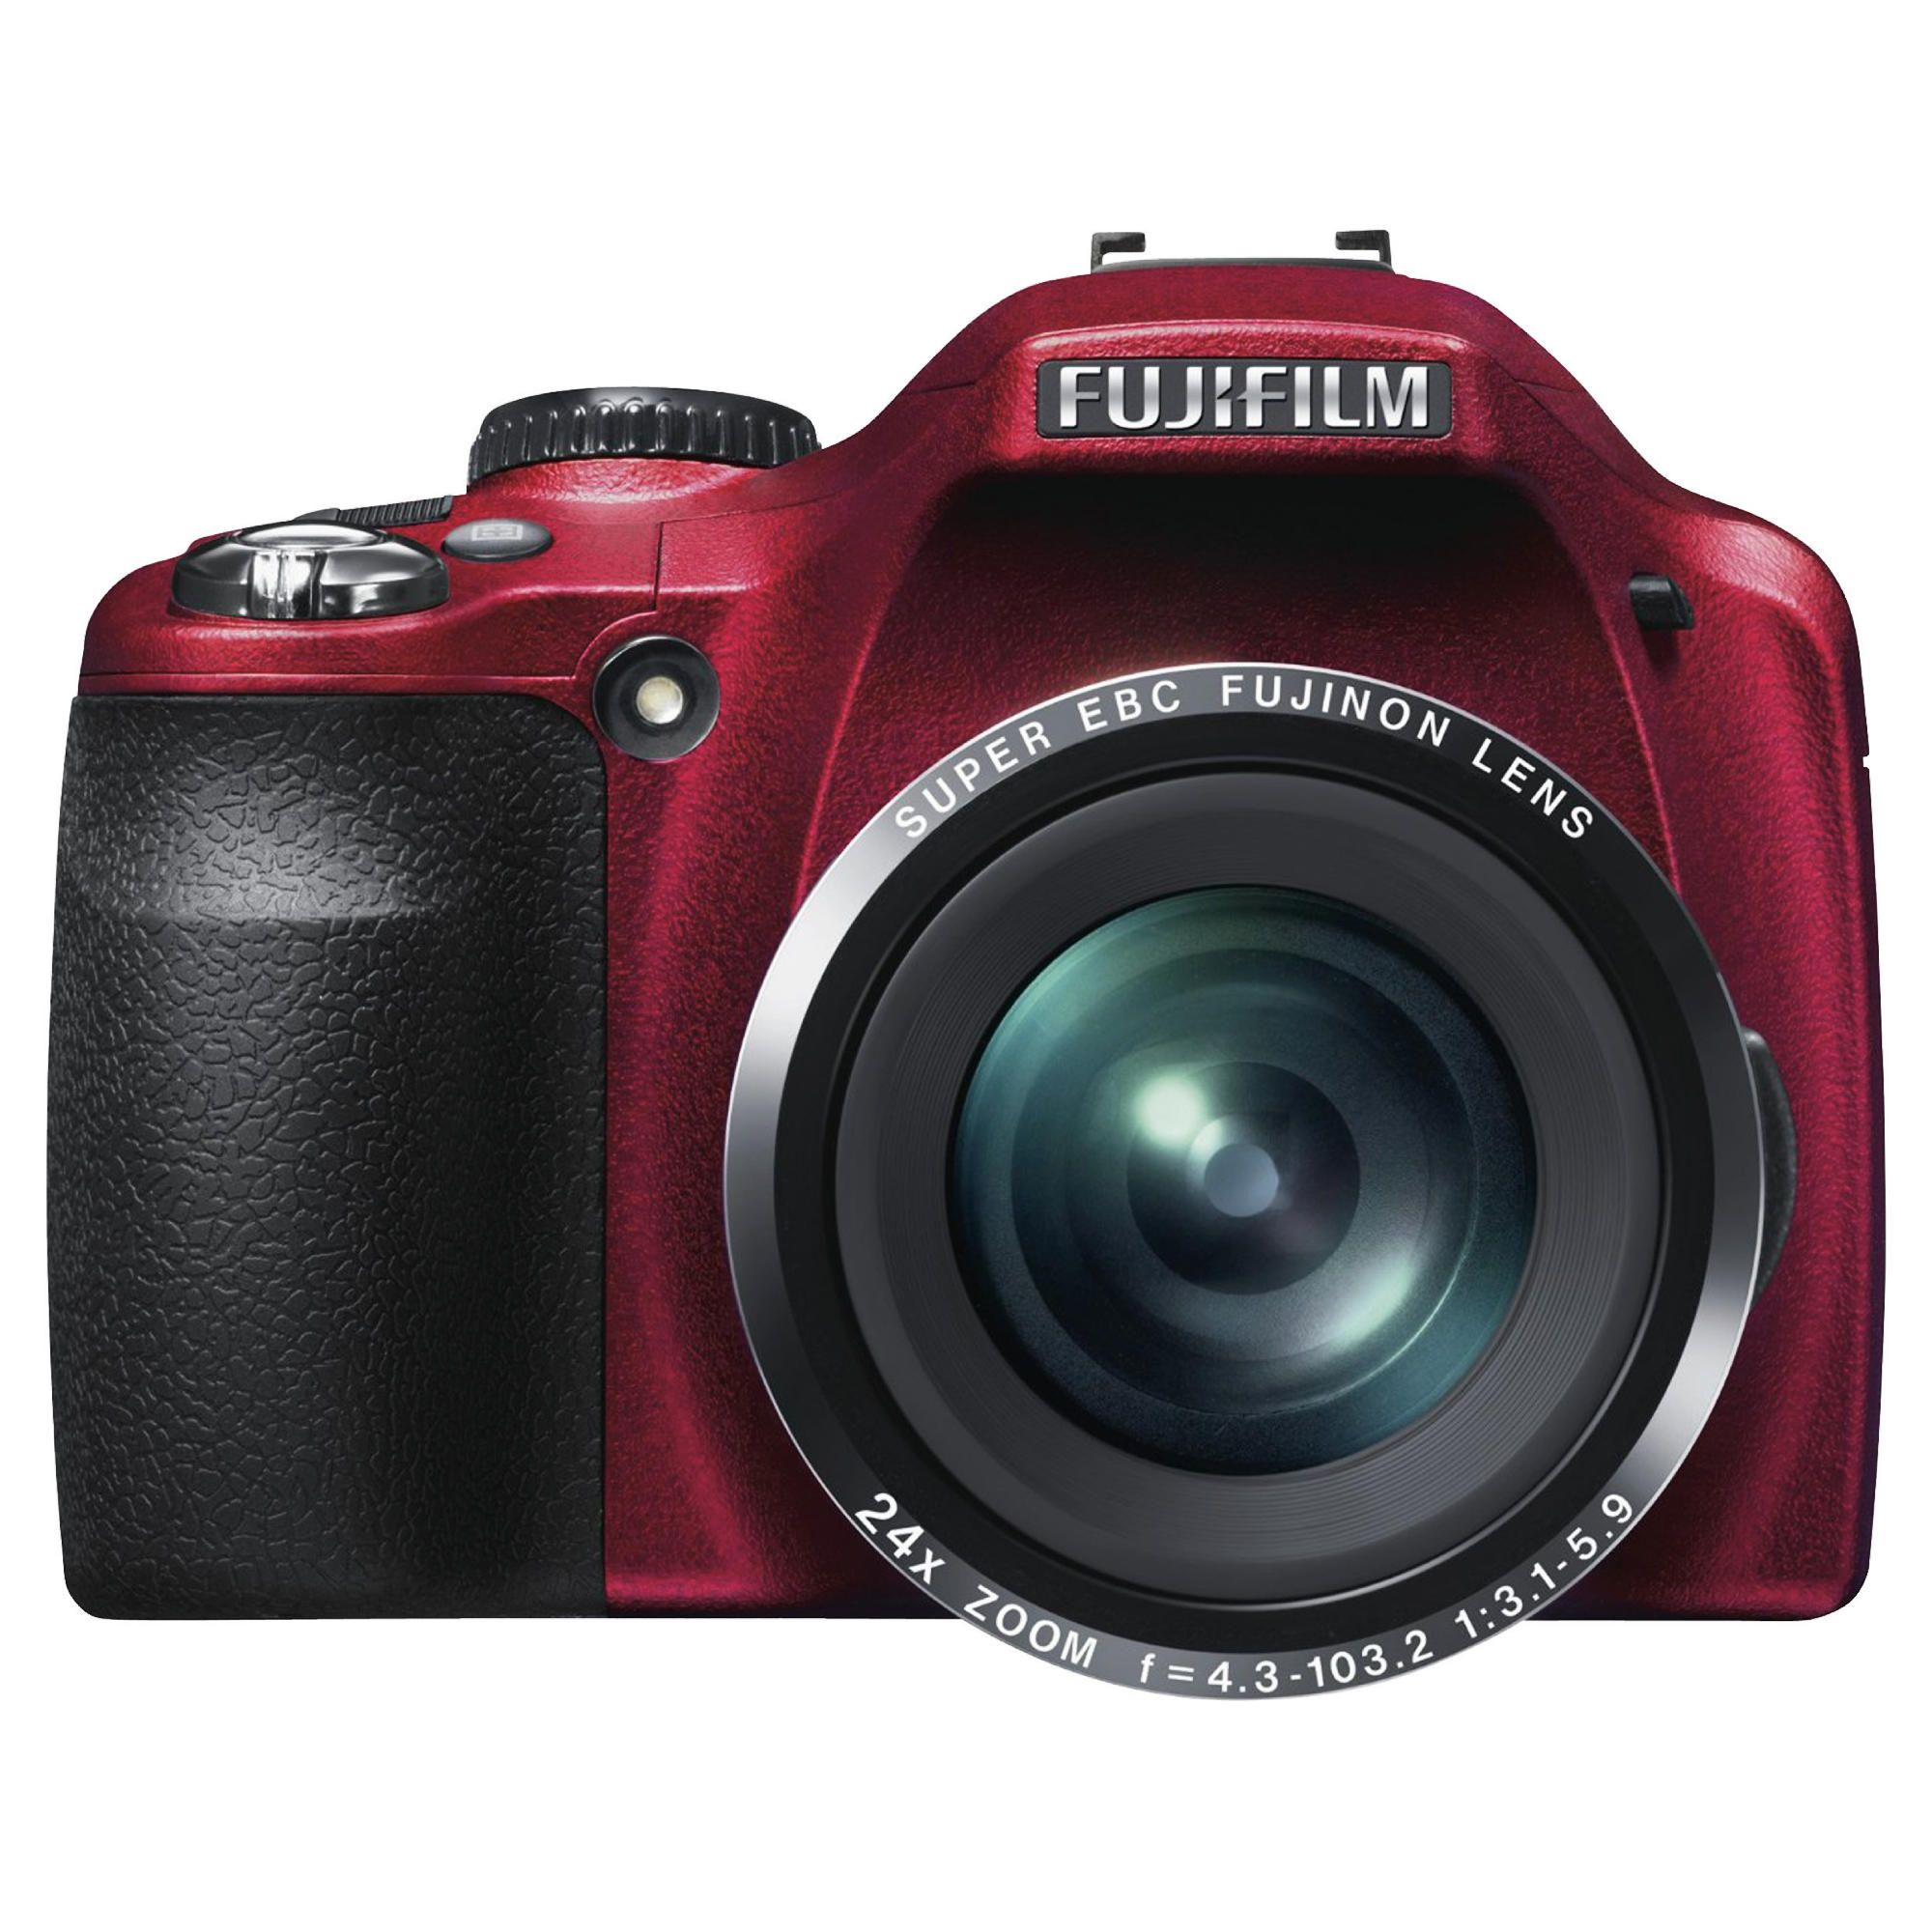 Fuji SL240 Digital Camera, Red, 14MP, 24x Optical Zoom, 3.0 inch LCD Screen